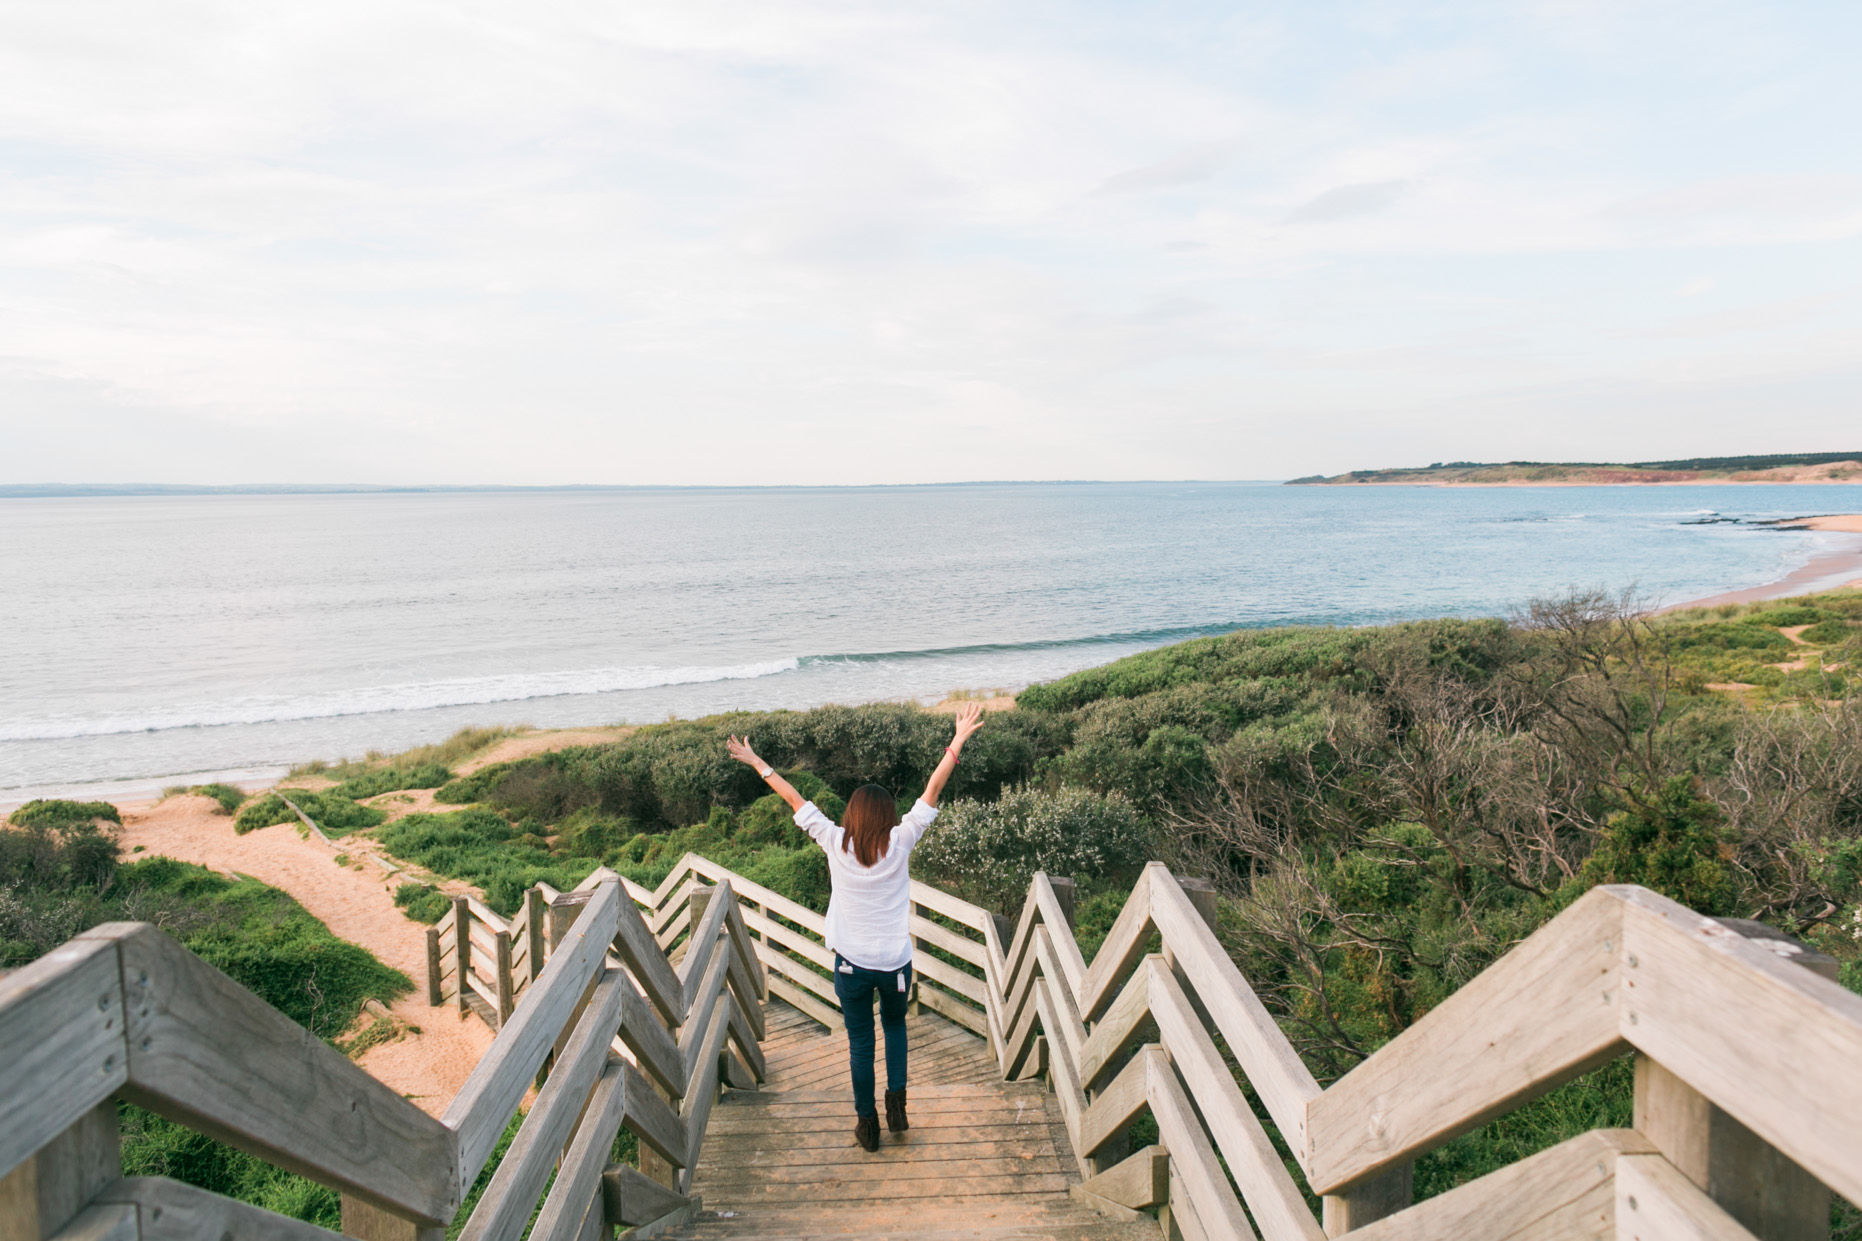 23-hellojanelee-roadtrip-australia